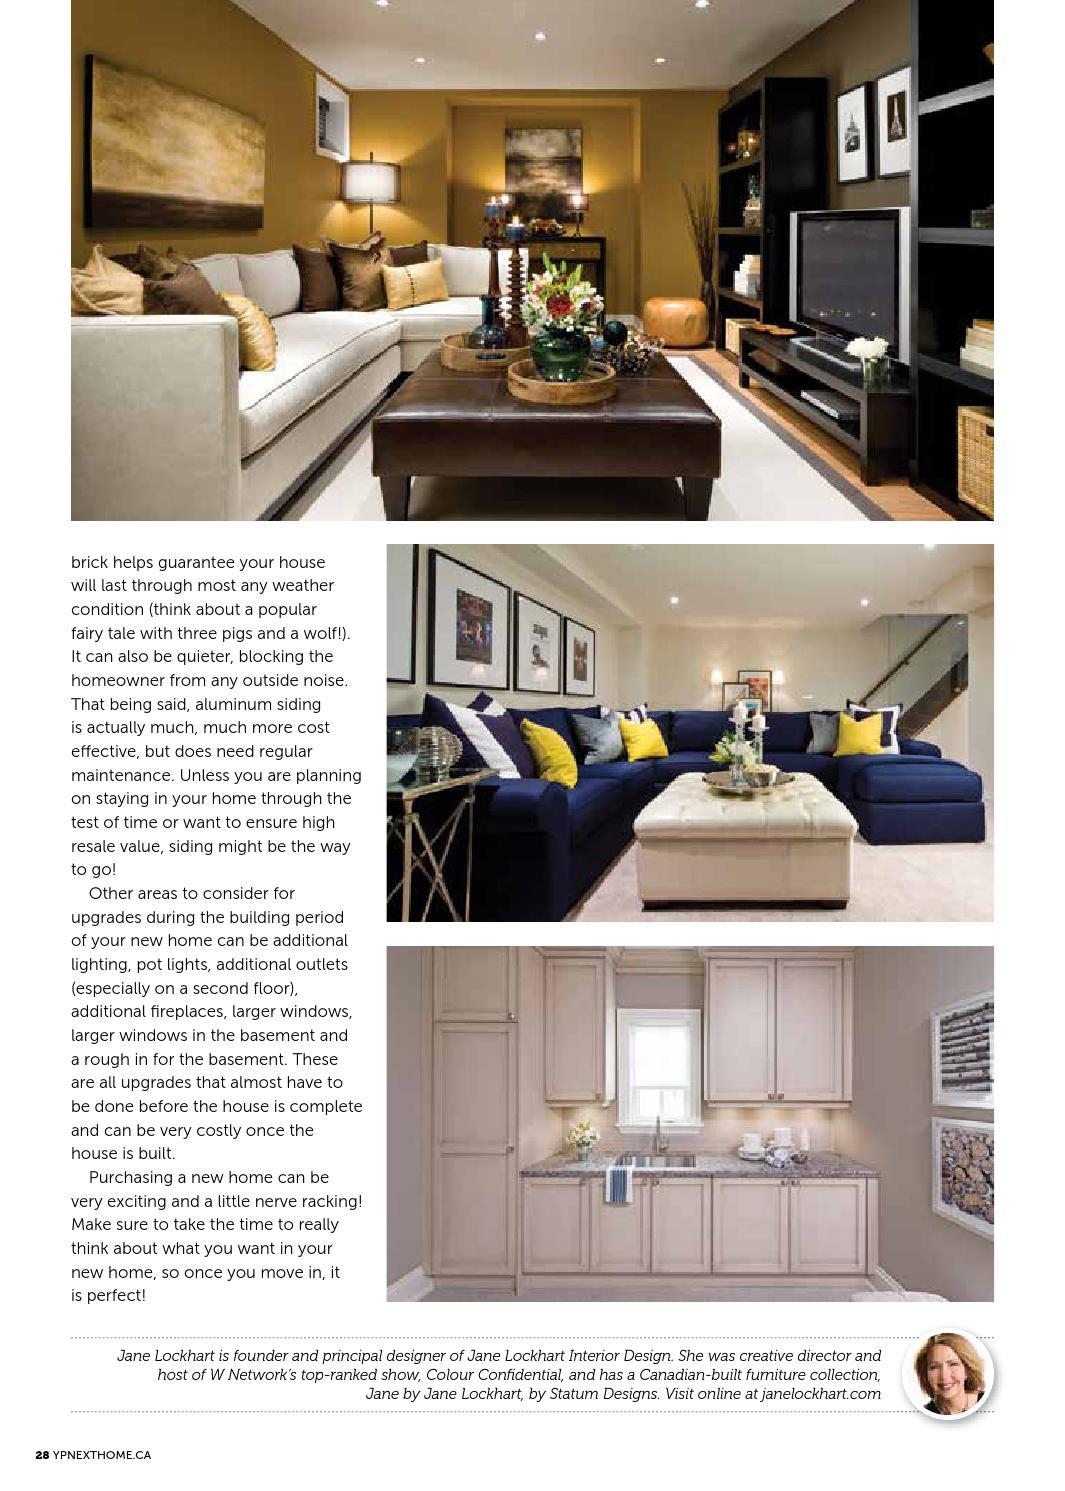 Eastern Ontario New Home & Condo Guide - Sept 19, 2015